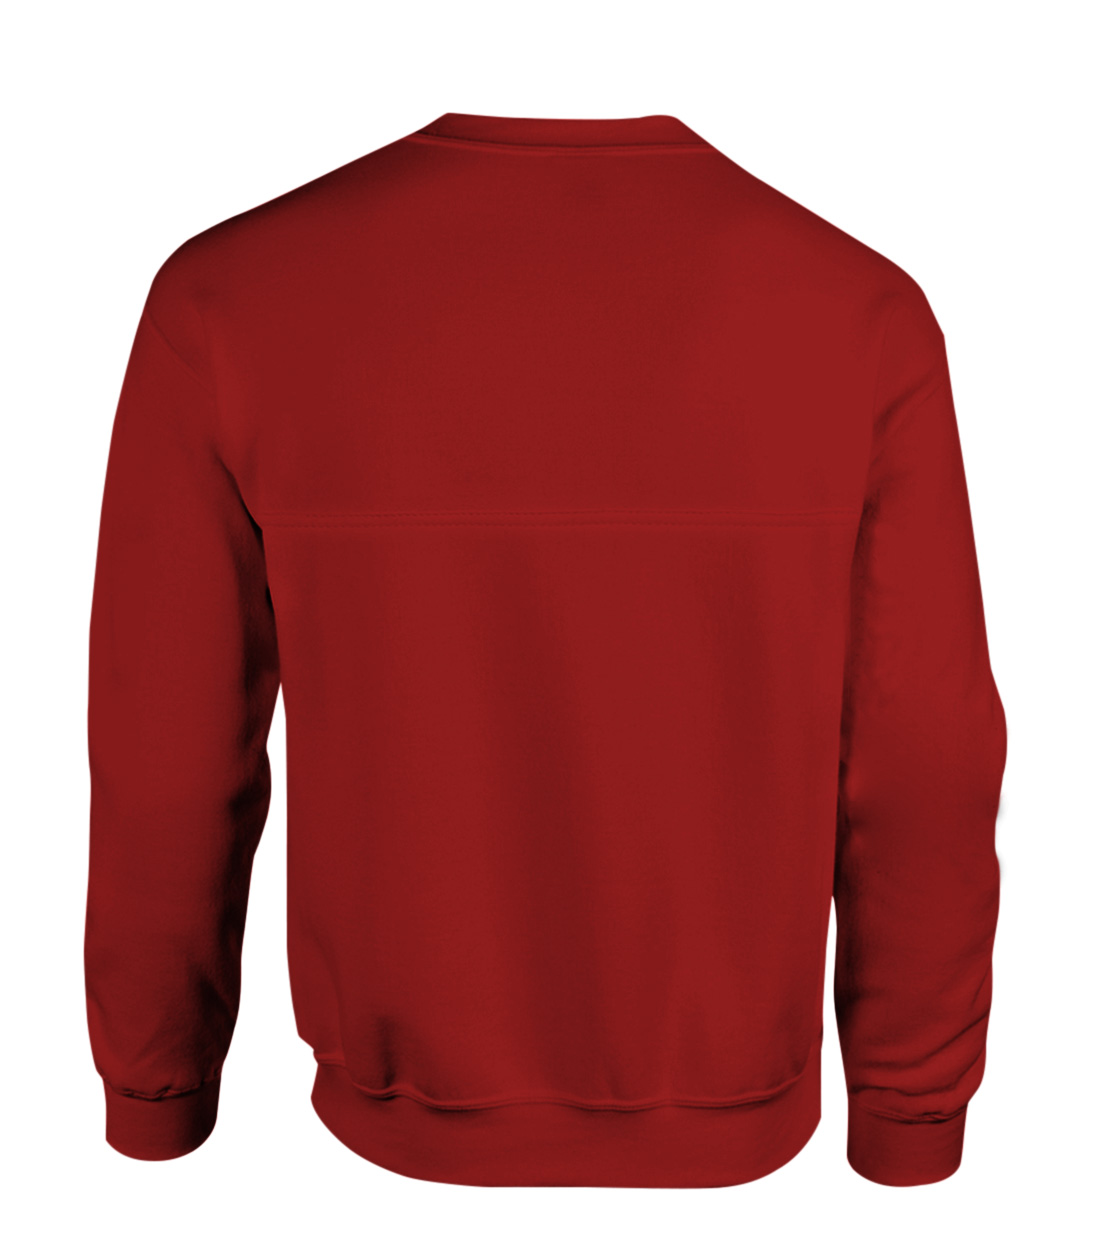 LeBron James Basic (BSC-red-145-PLYR-JAMES.23)